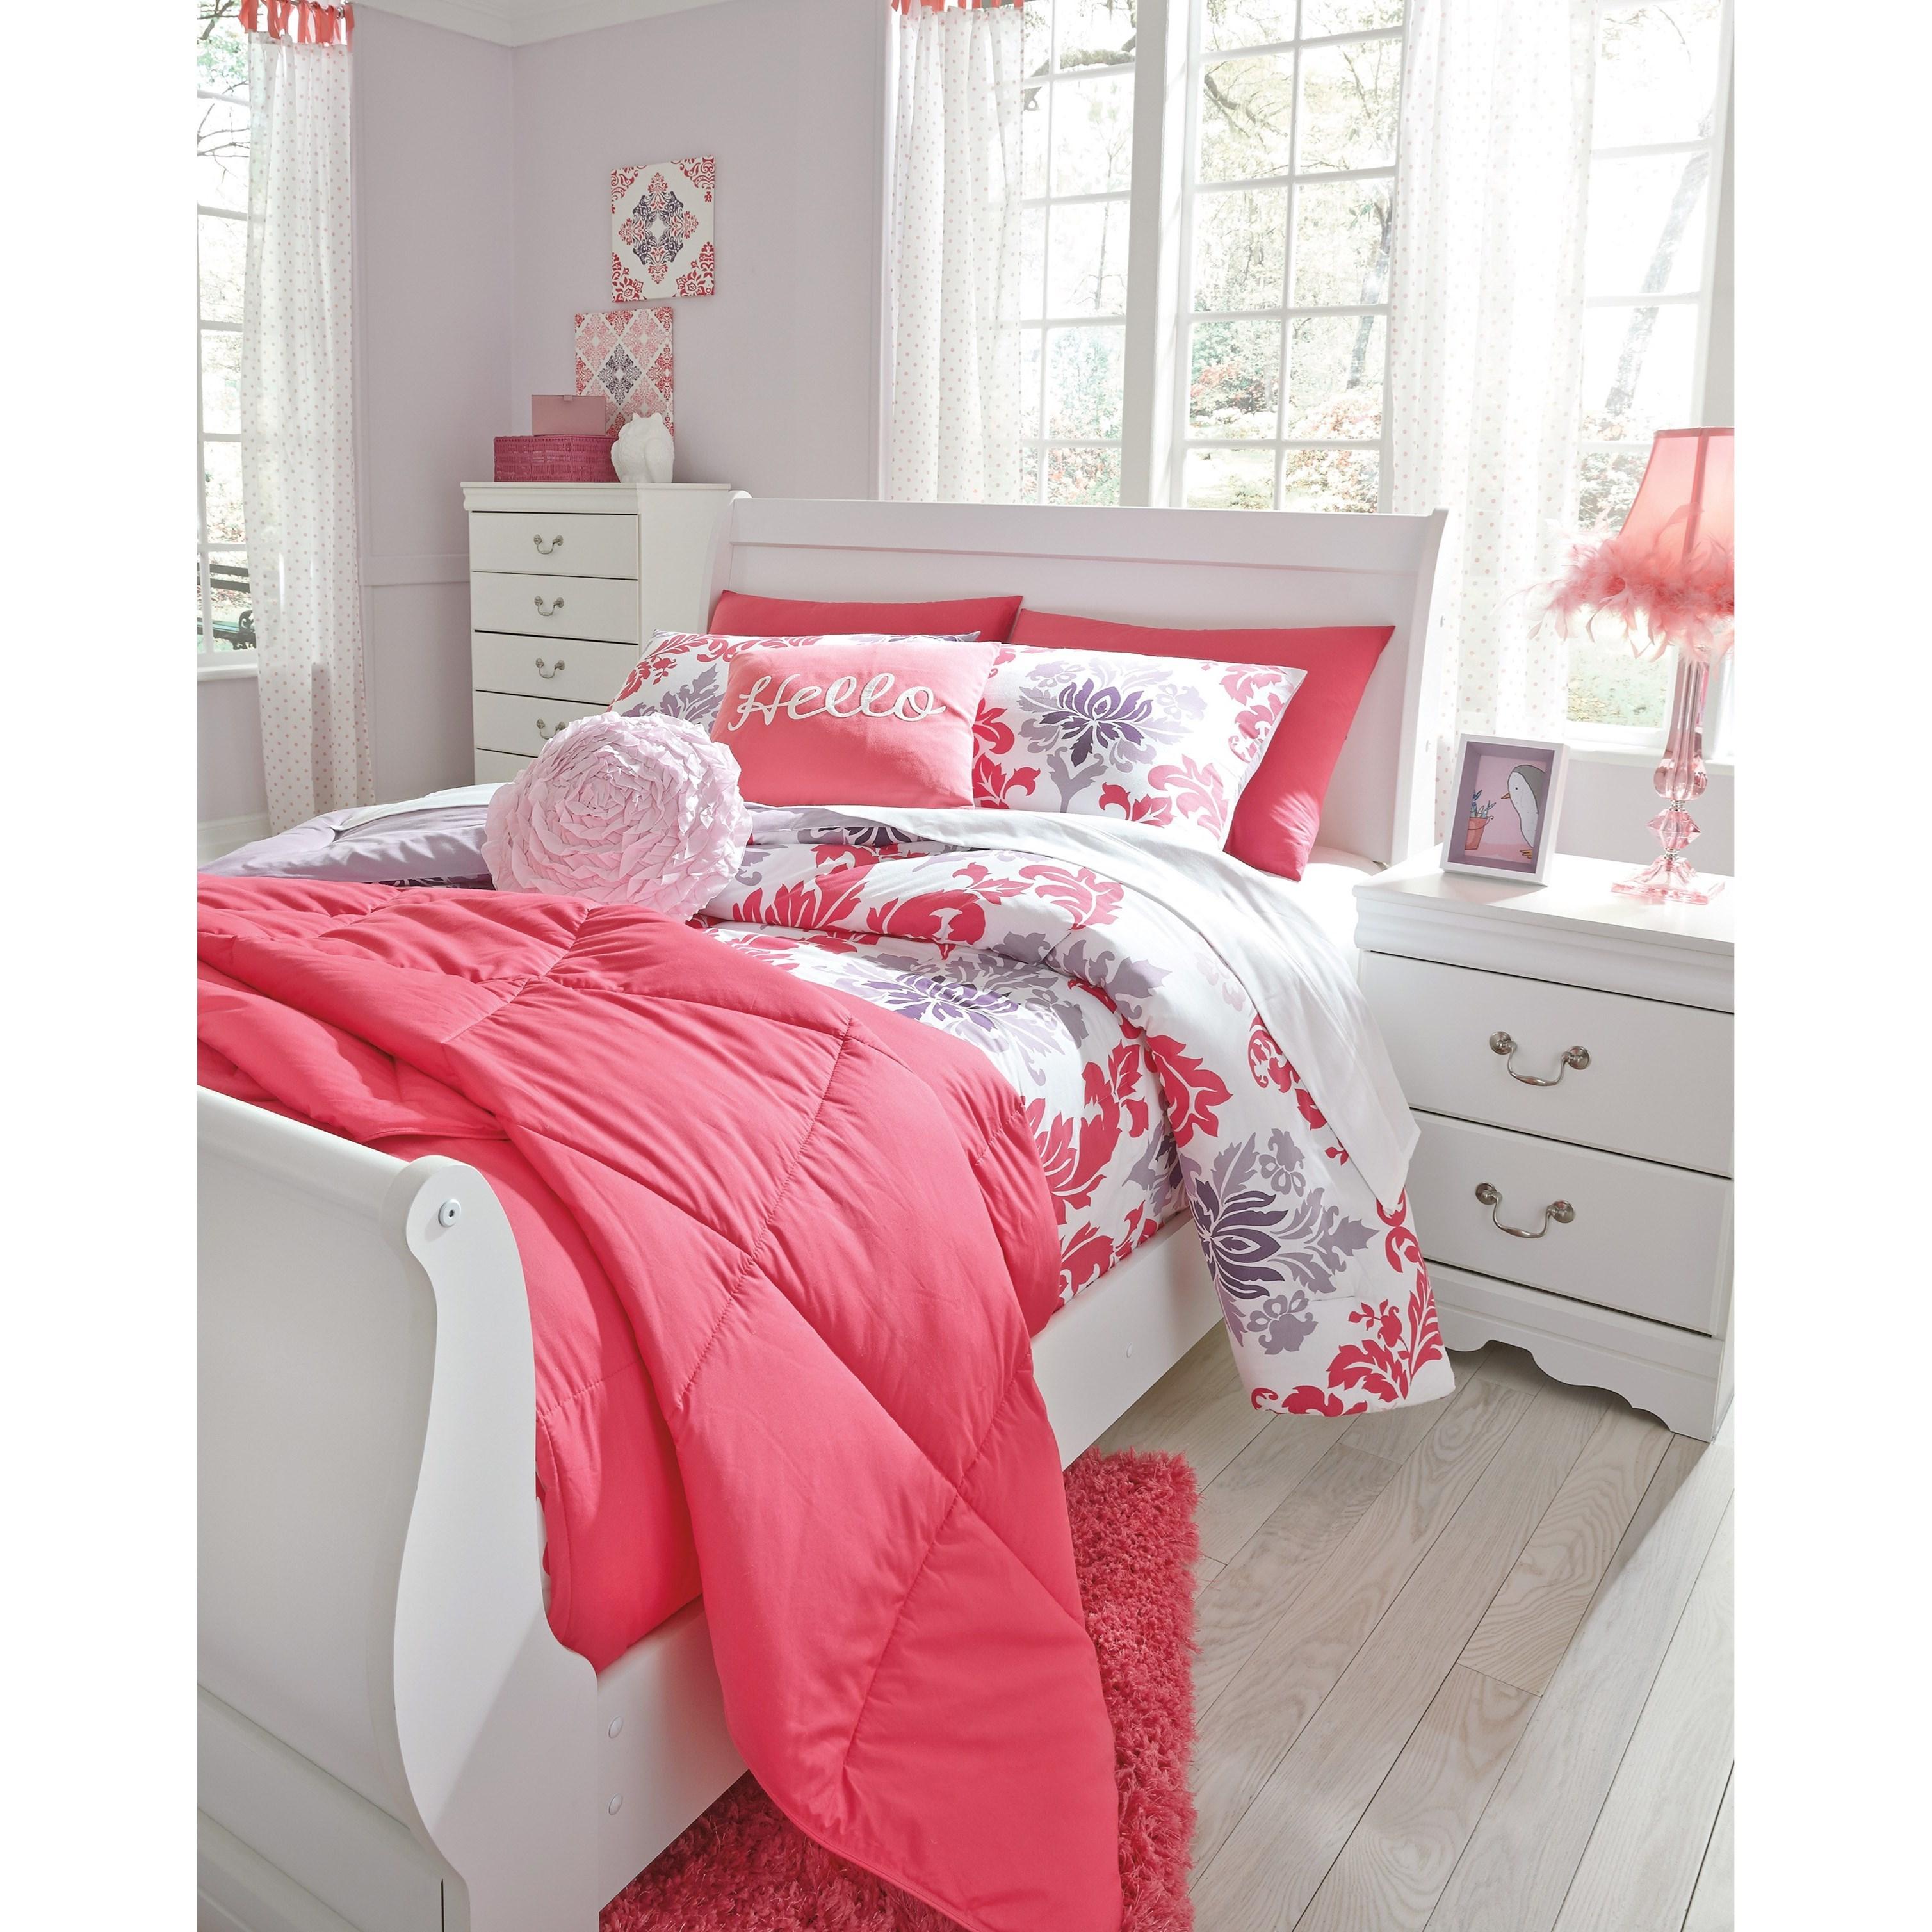 Timberline Sleigh Bedroom Set Signature Design: Ashley Signature Design Anarasia Full Louis Philippe